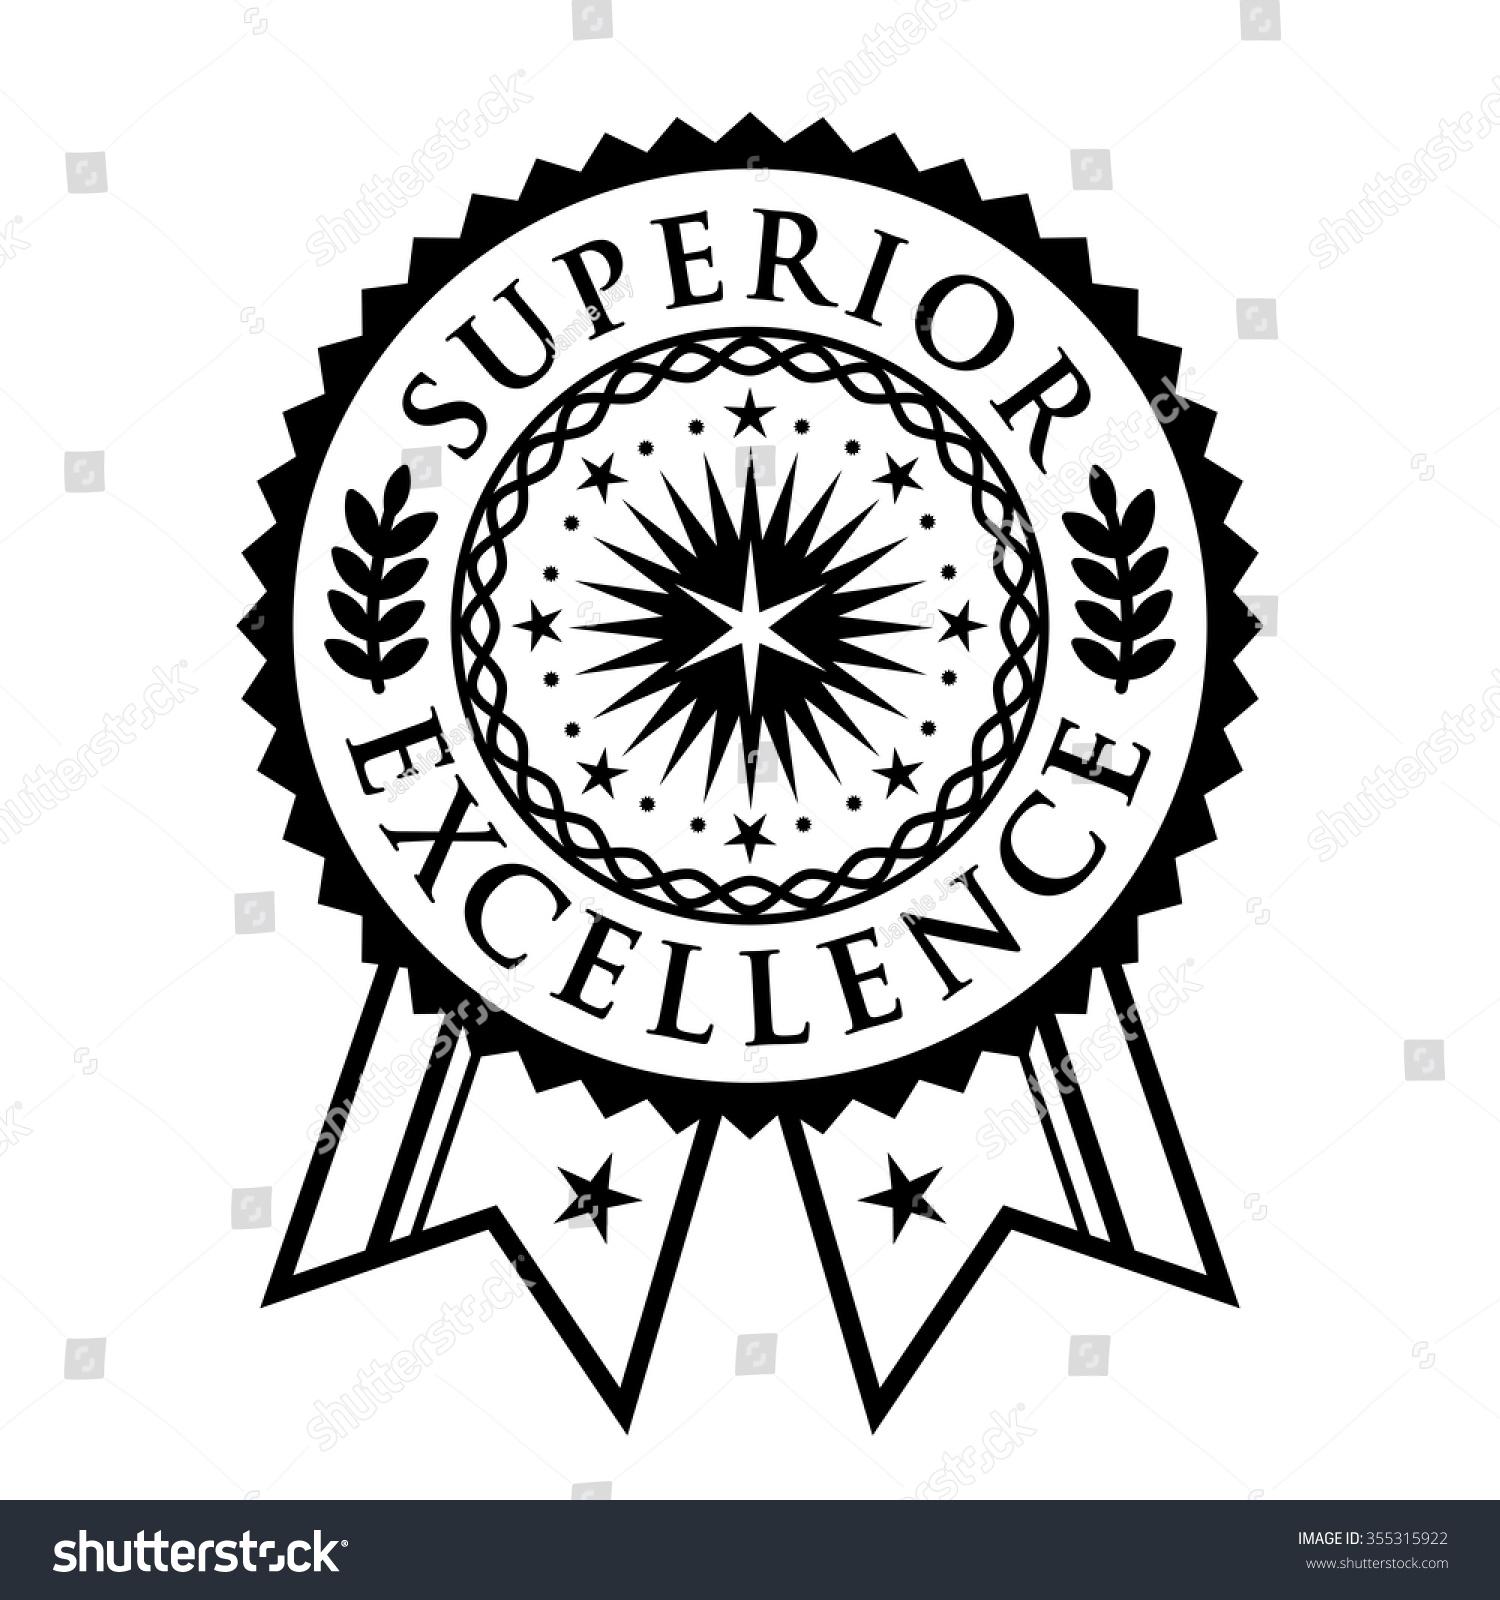 Certificate Seal Emblem Superior Excellence Achievement Stock Vector